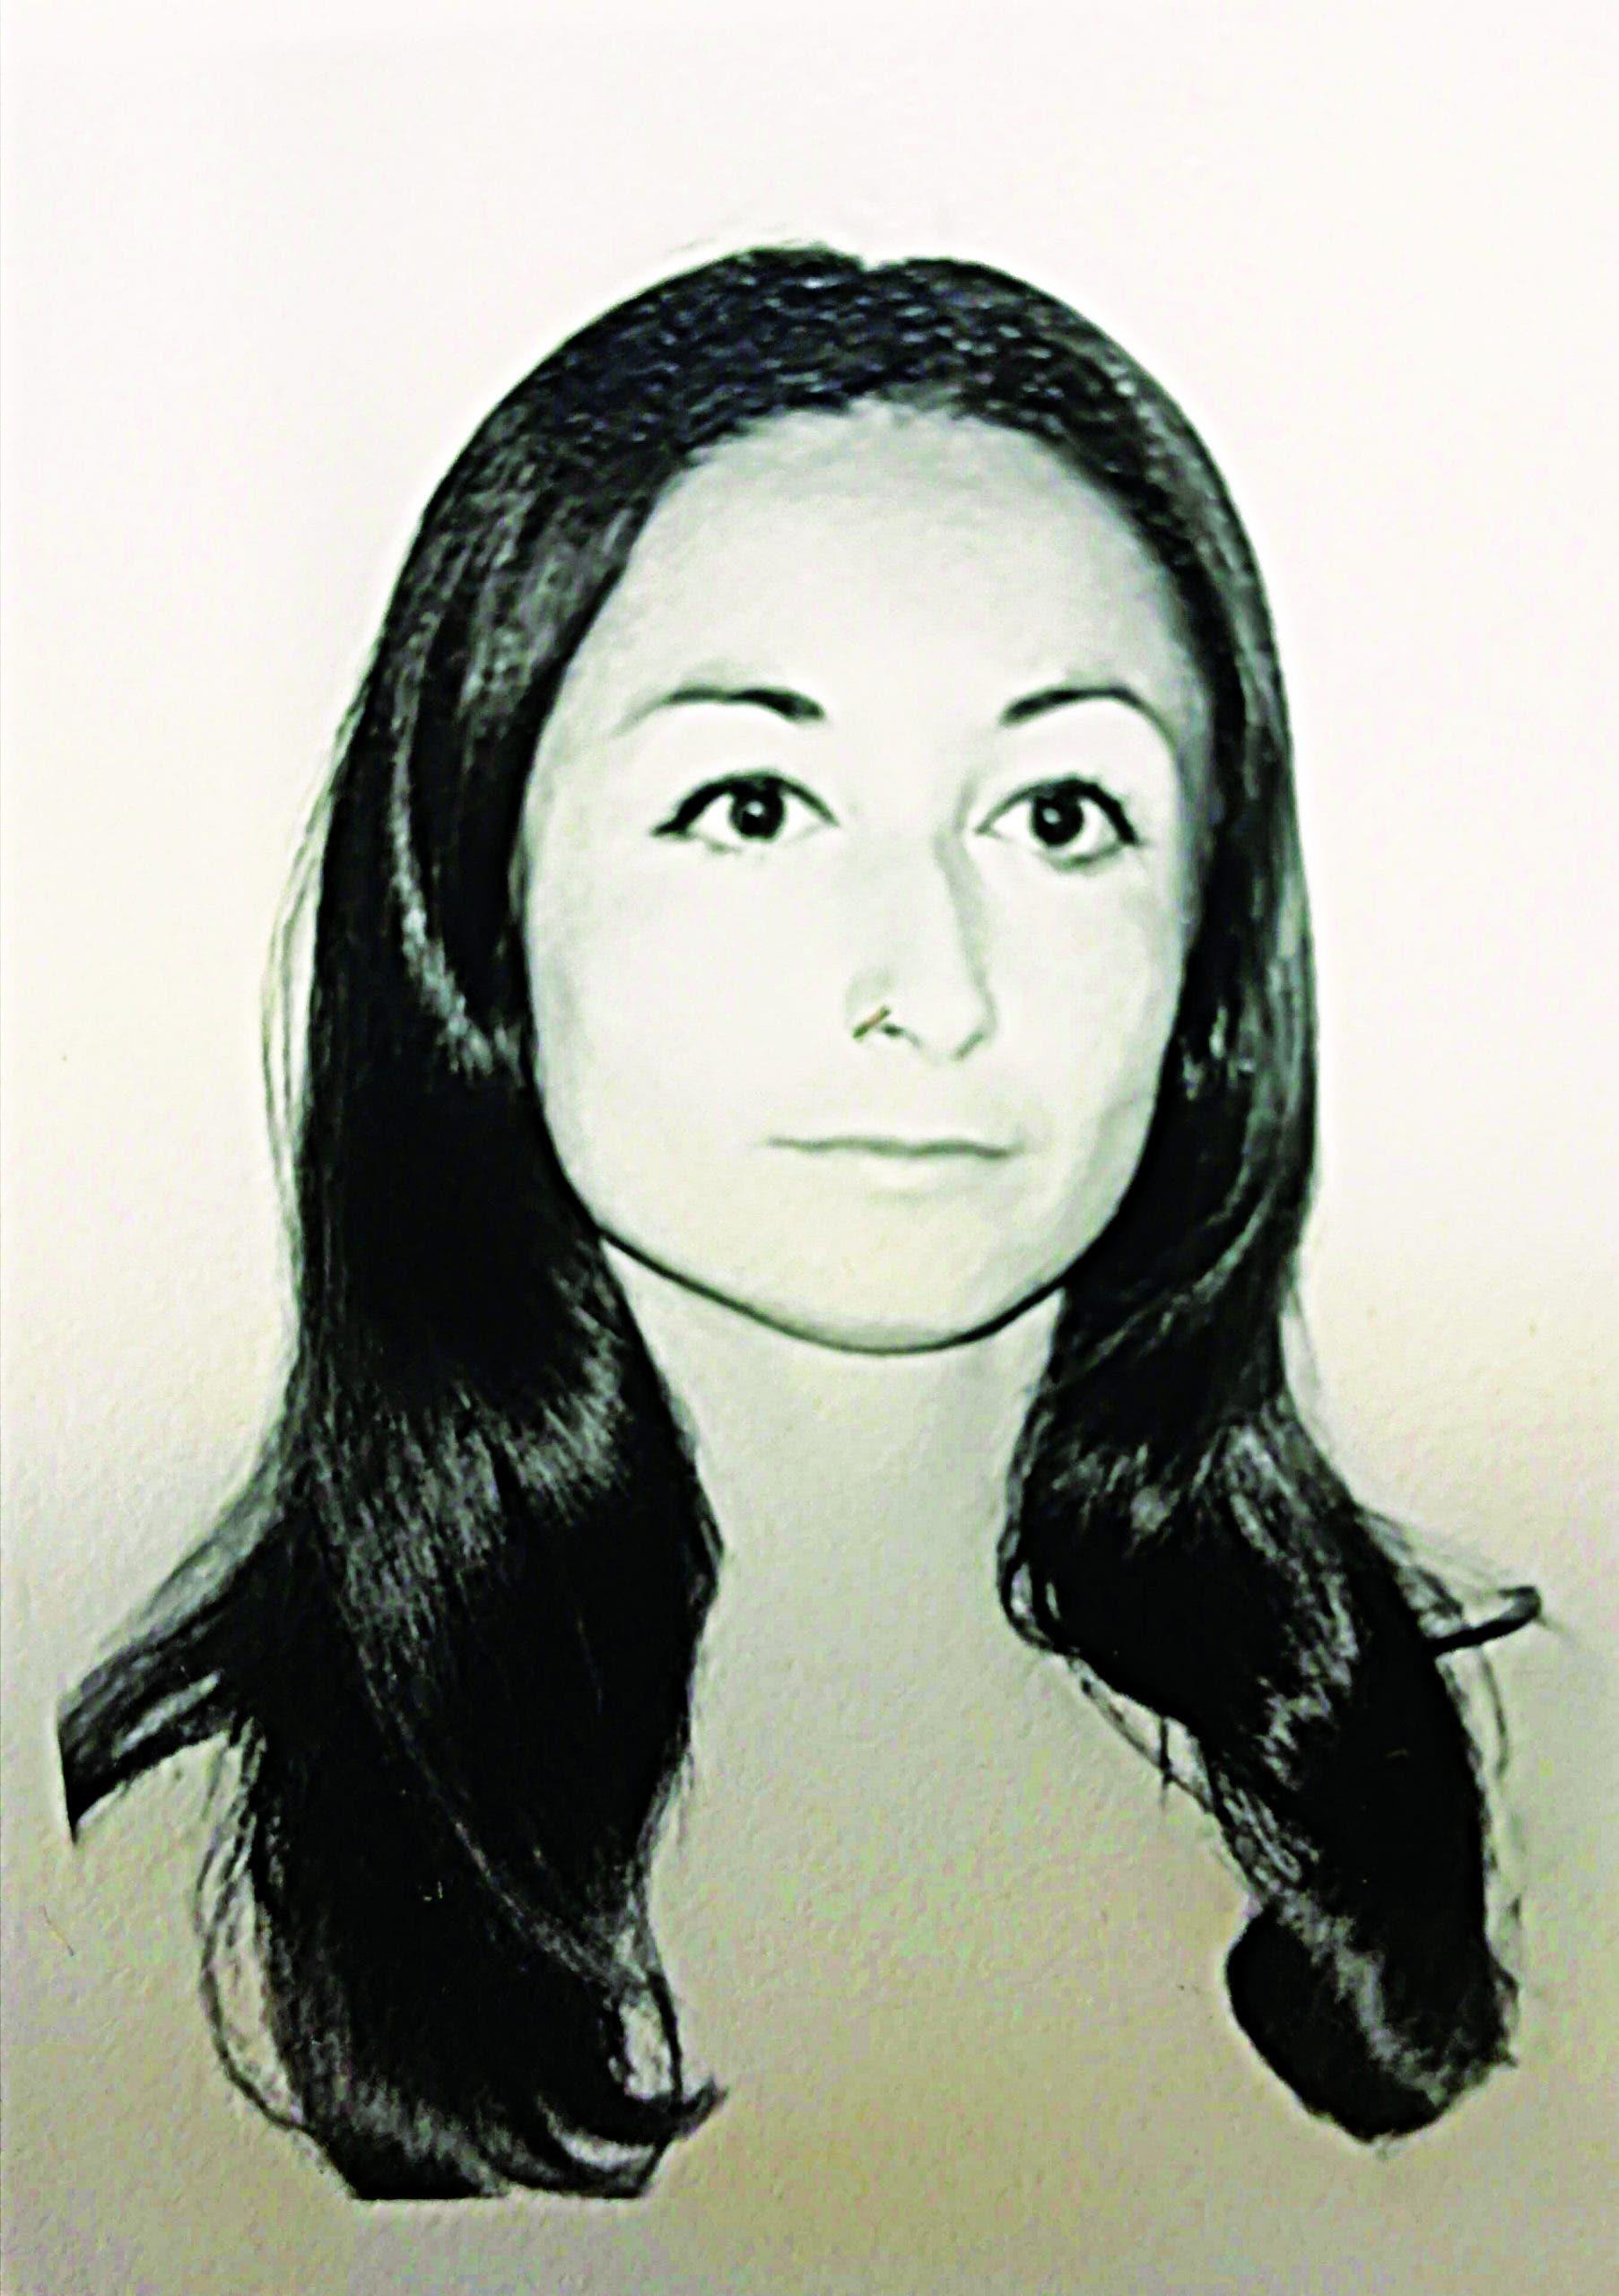 First Passport Pic Isabel Marquez Feixas